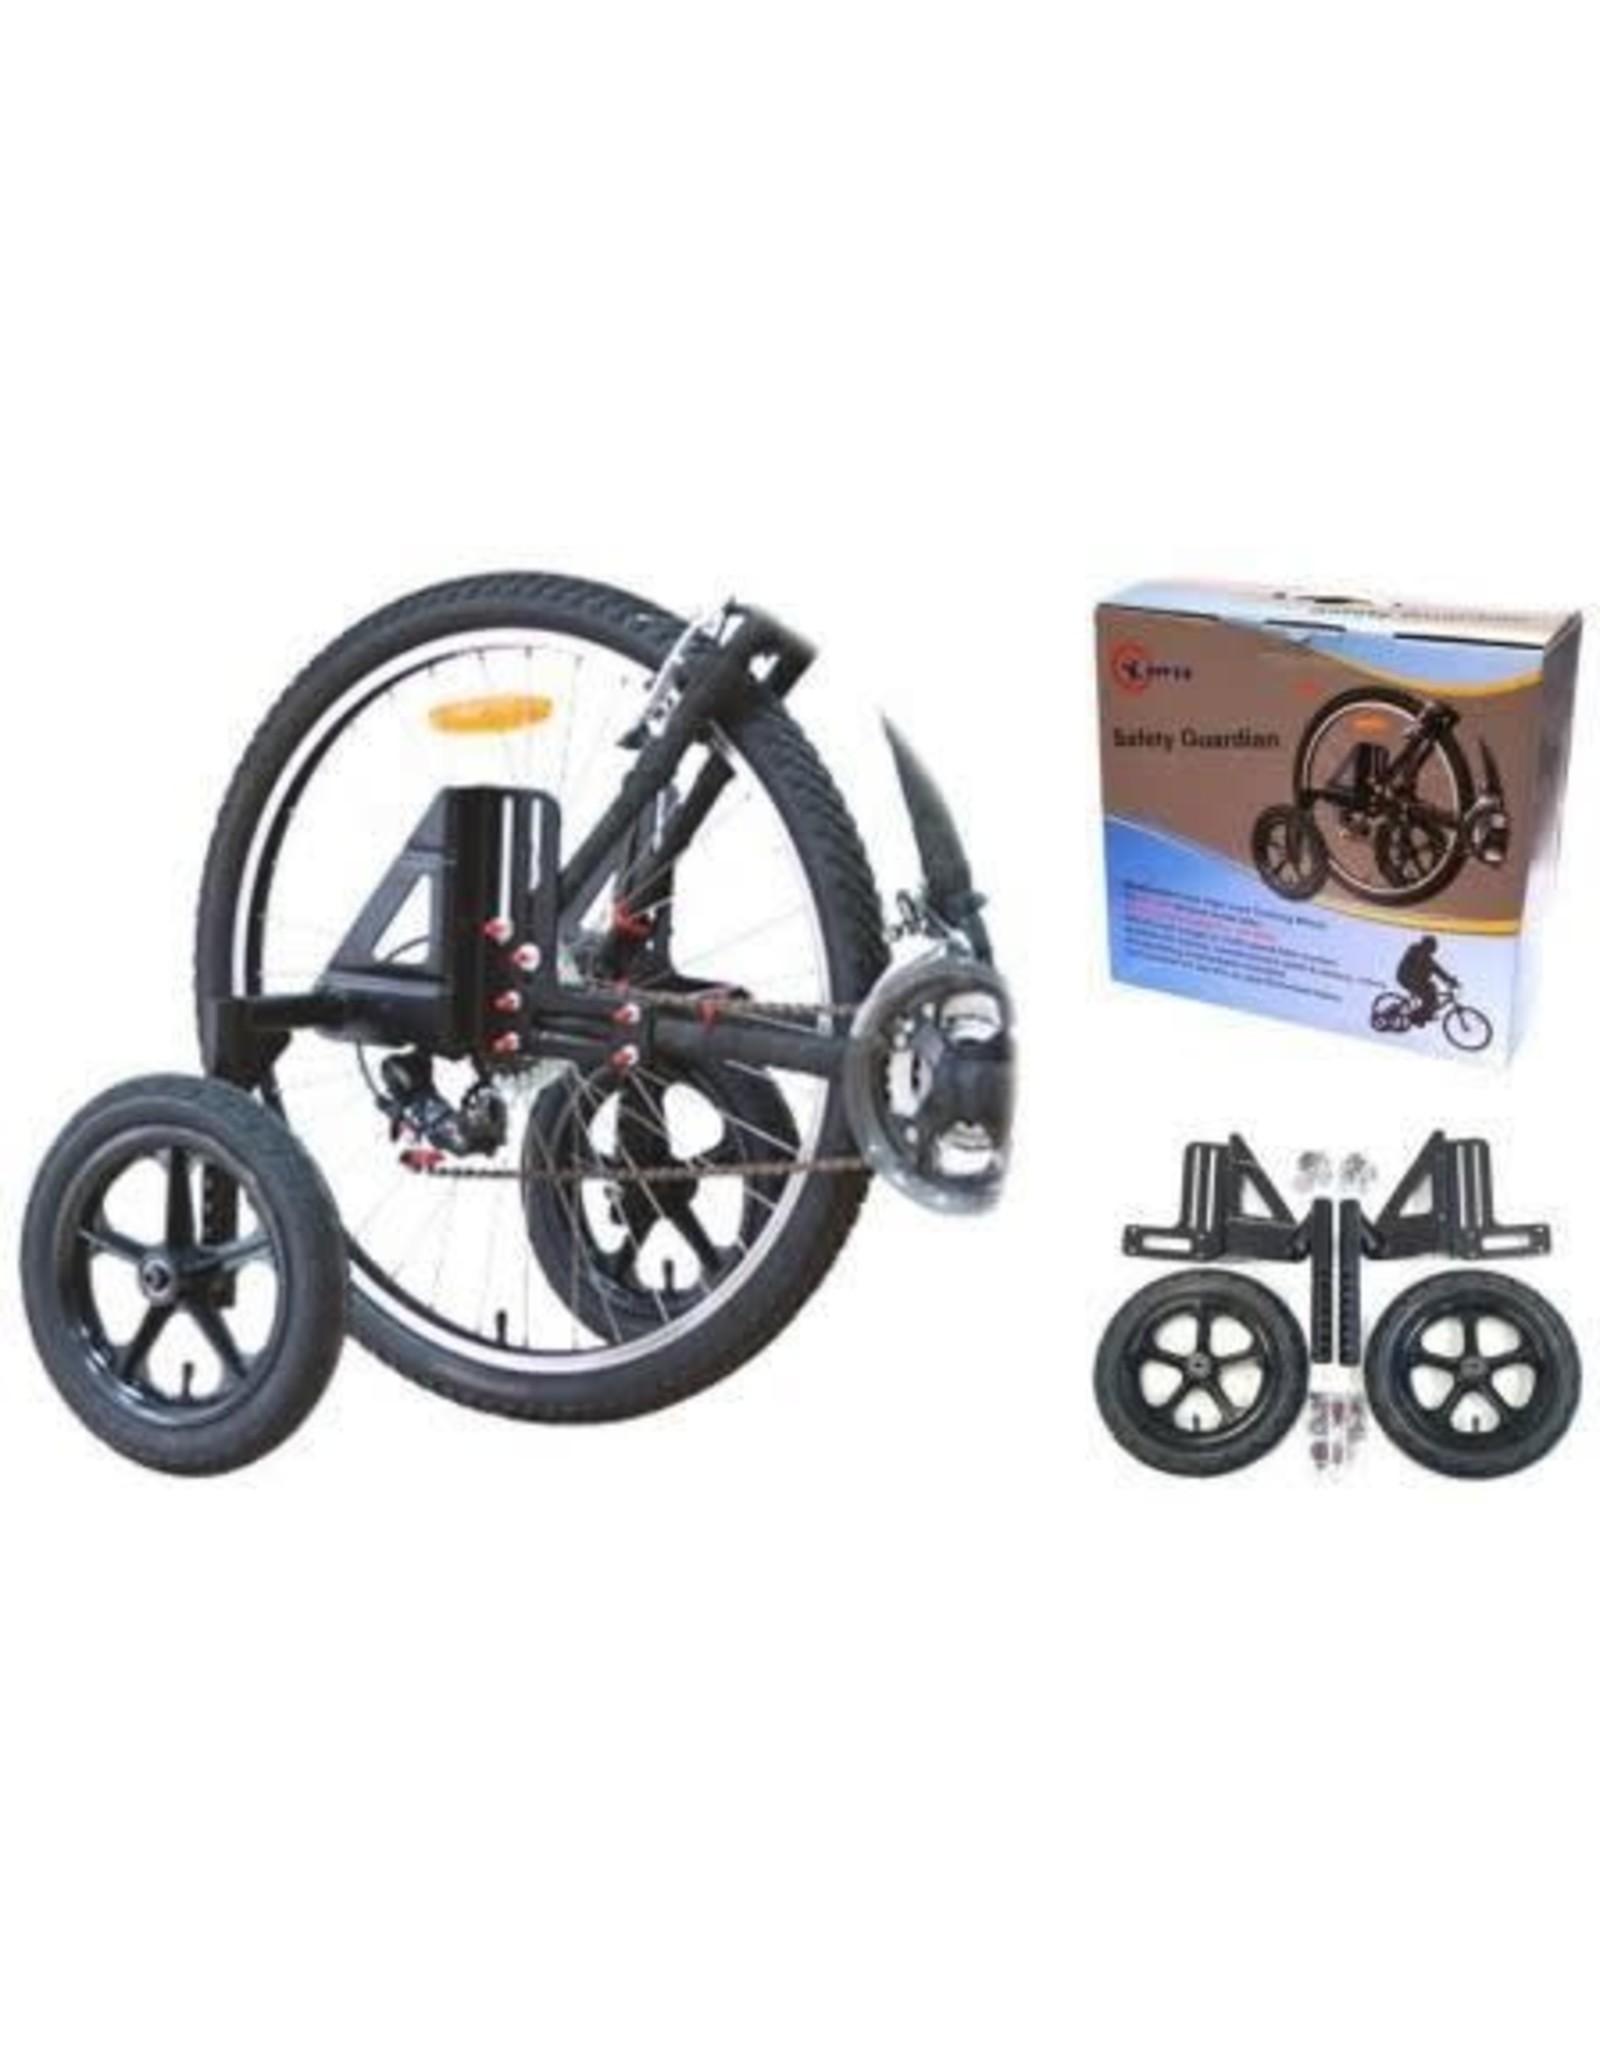 Training Wheels 20-29 Adult 120KG Cap